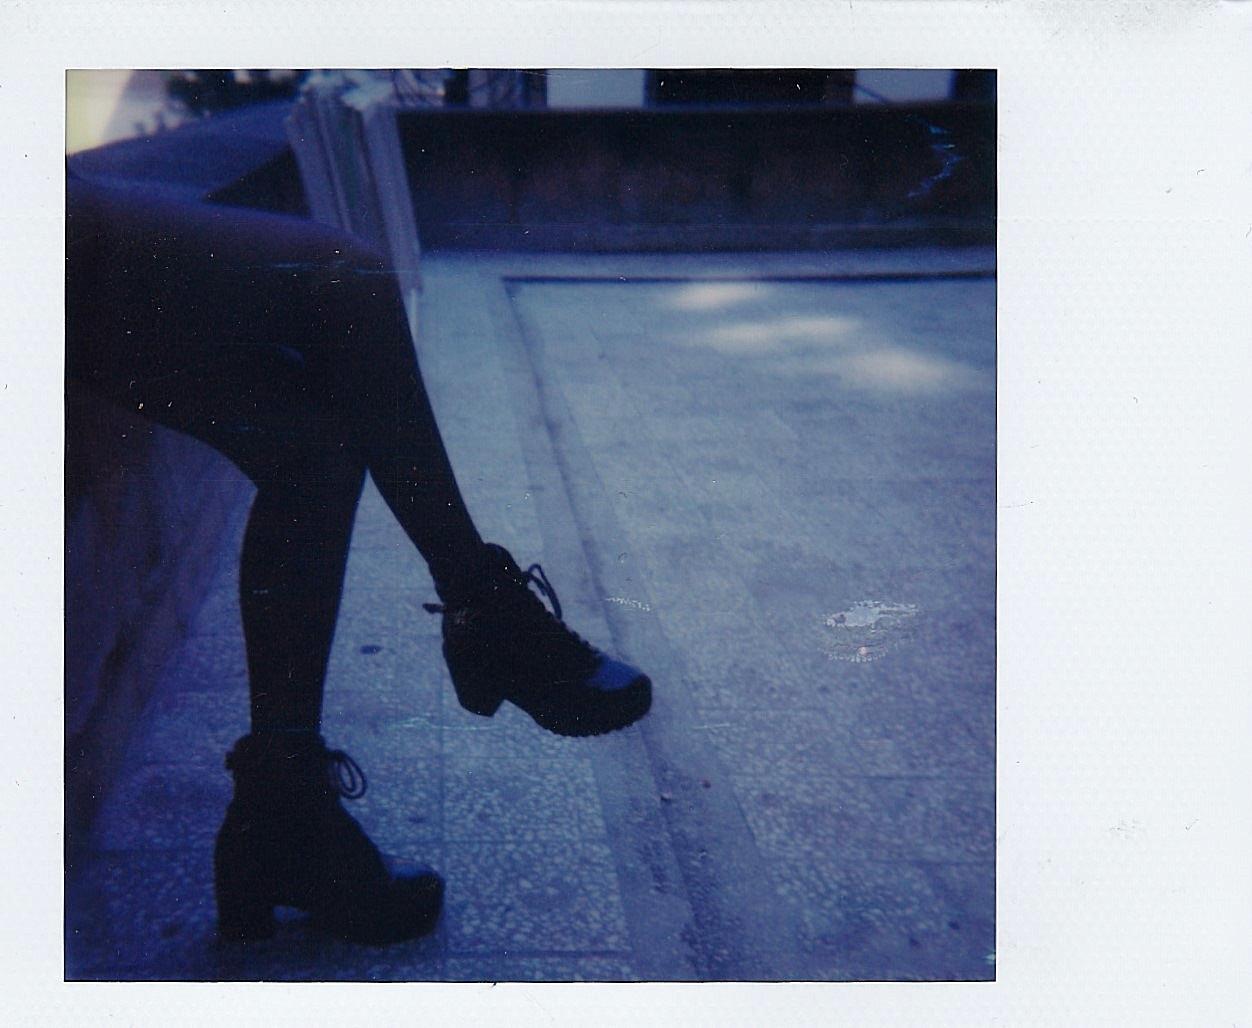 andreea-andrei-polaroid-semi-zine-feature-photography-image-8.jpg